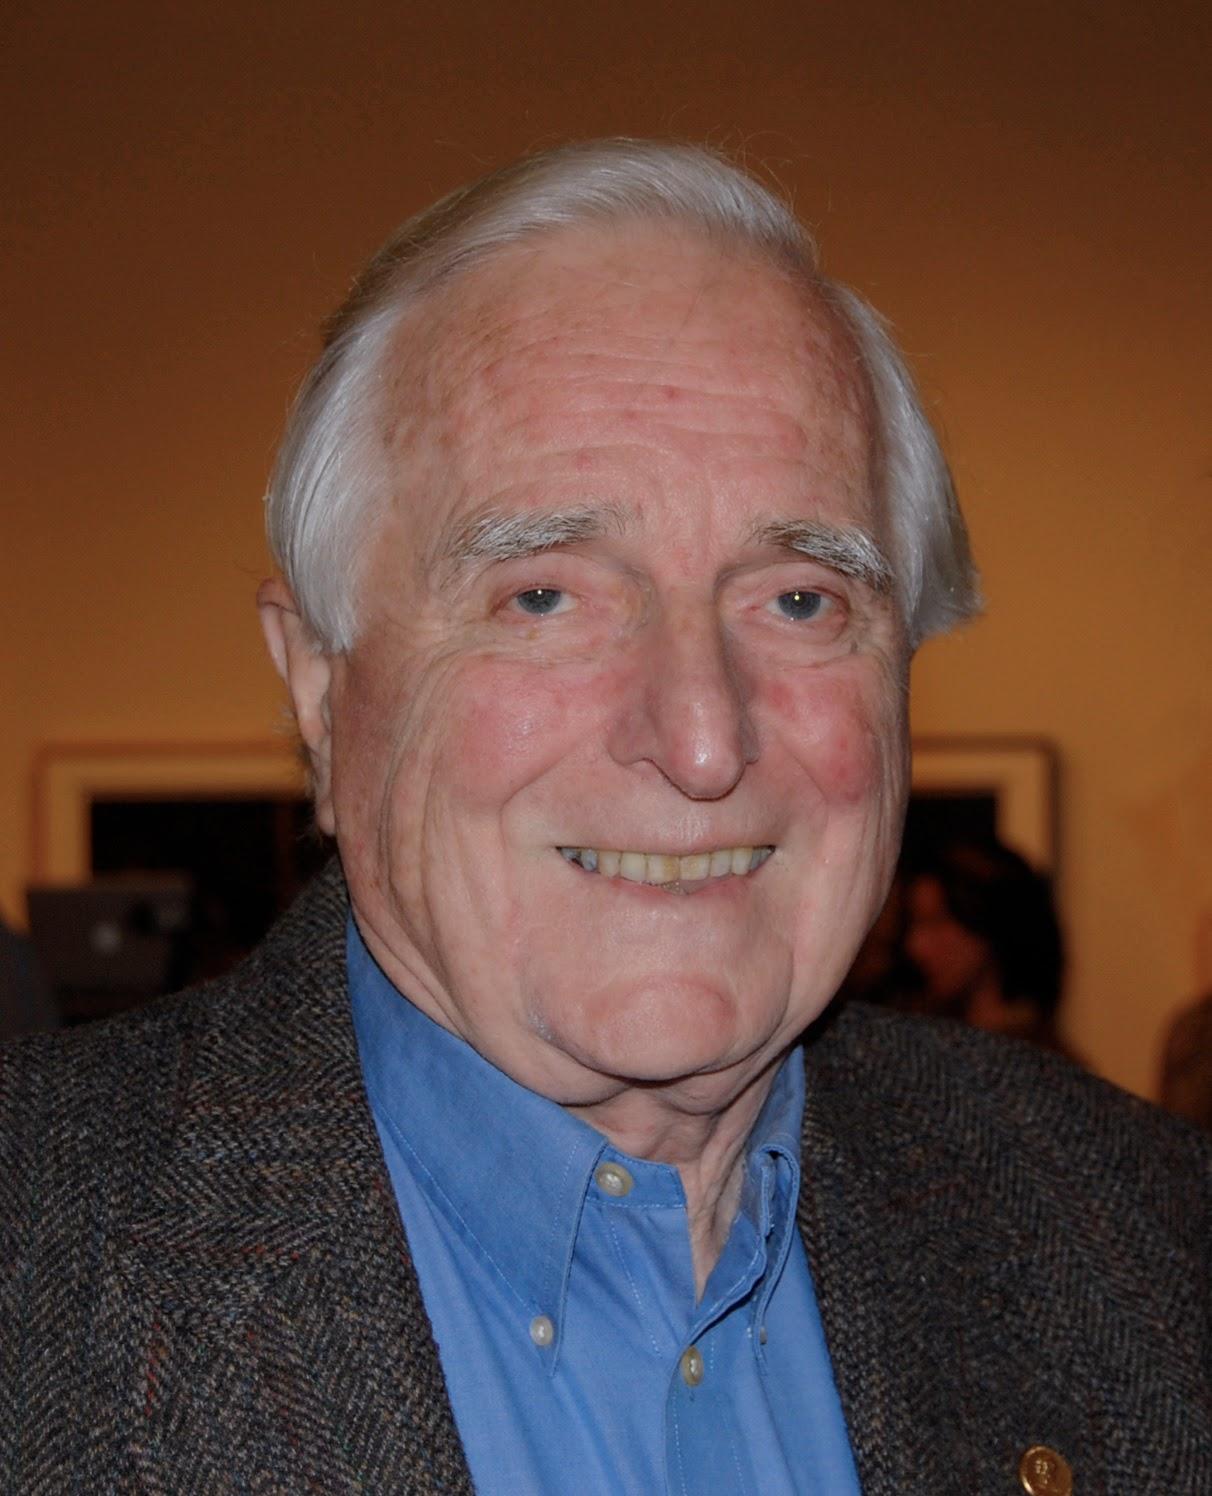 Douglas Engelbart. Image: Wikipedia